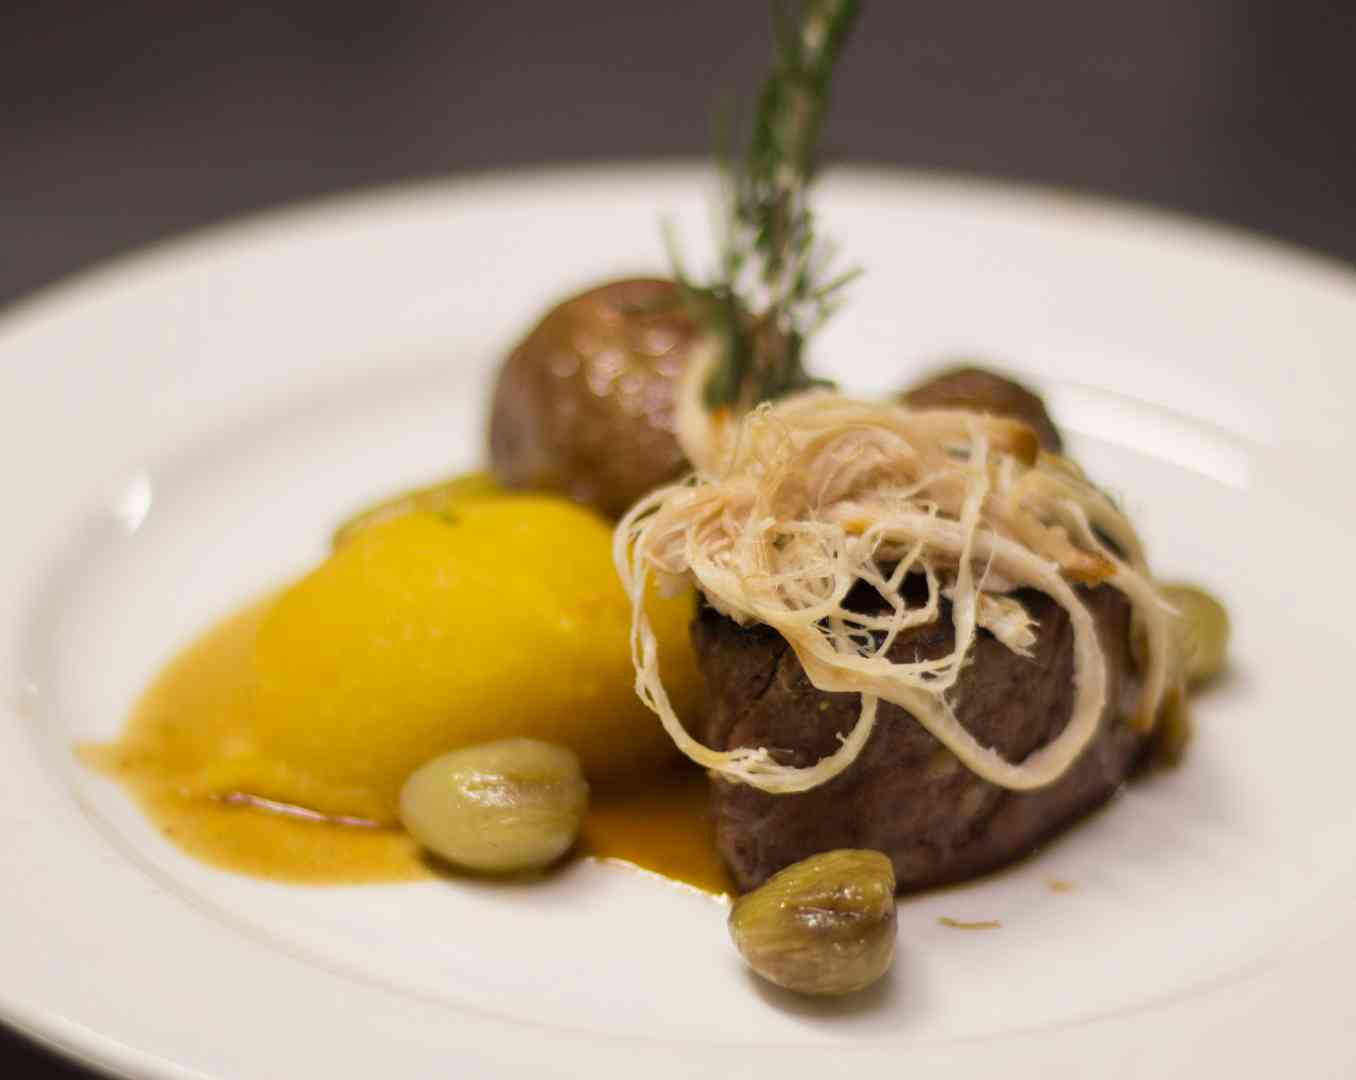 meat dish with garnish